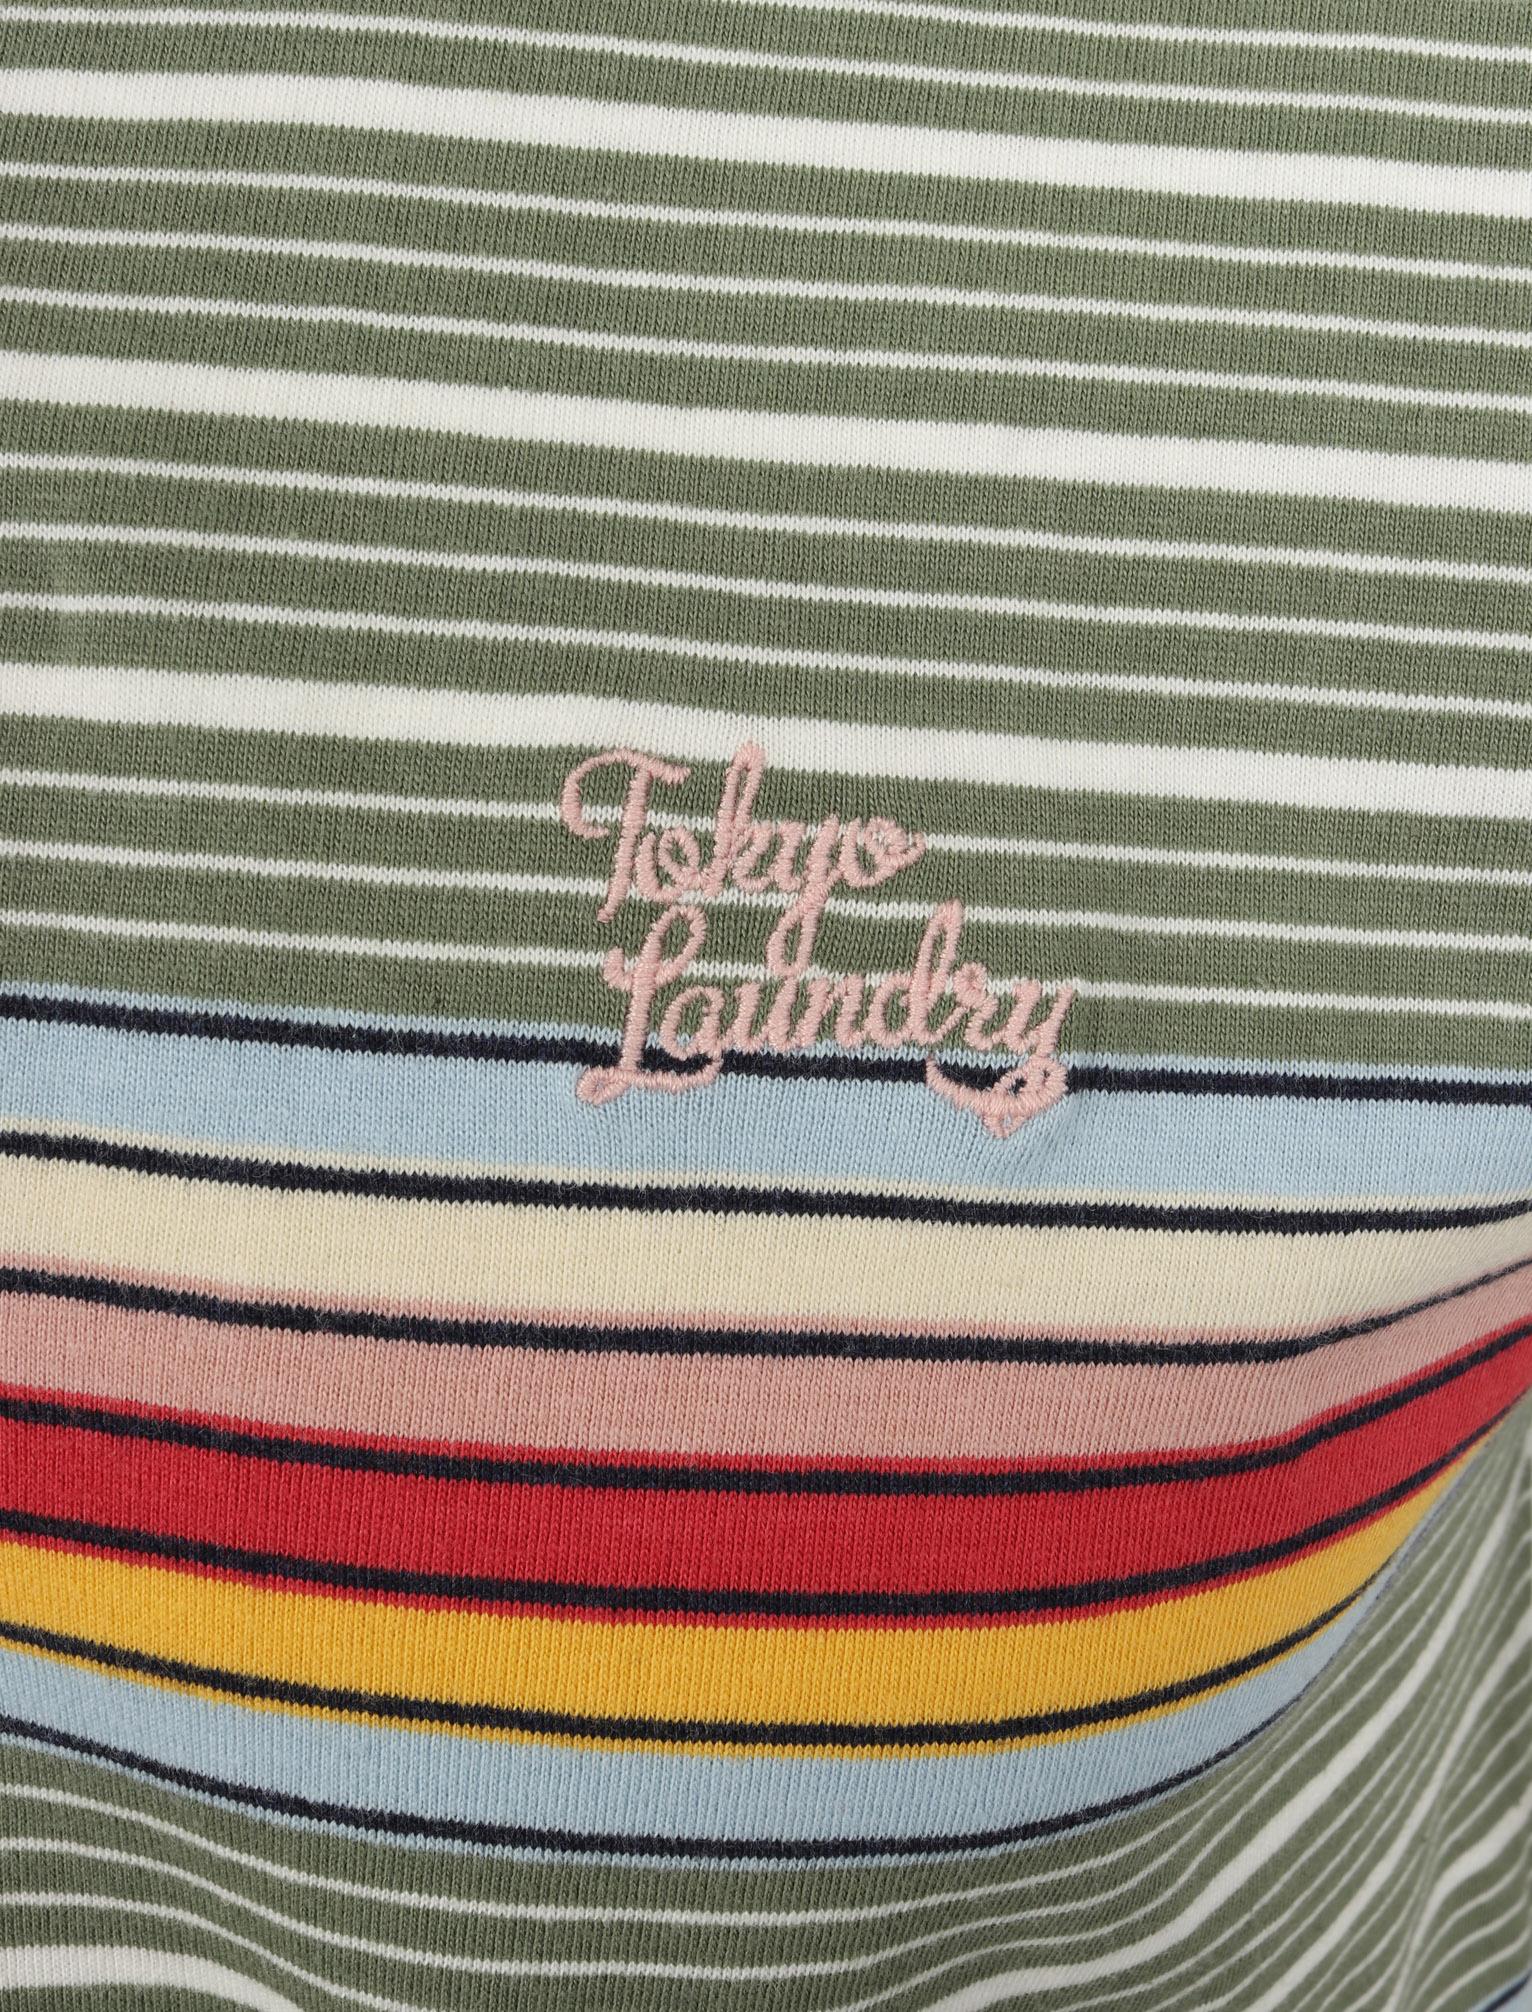 Tokyo-Laundry-Men-039-s-Bakersfield-Striped-Polo-Shirt-Stripy-Retro-Vintage-T-Shirt thumbnail 8